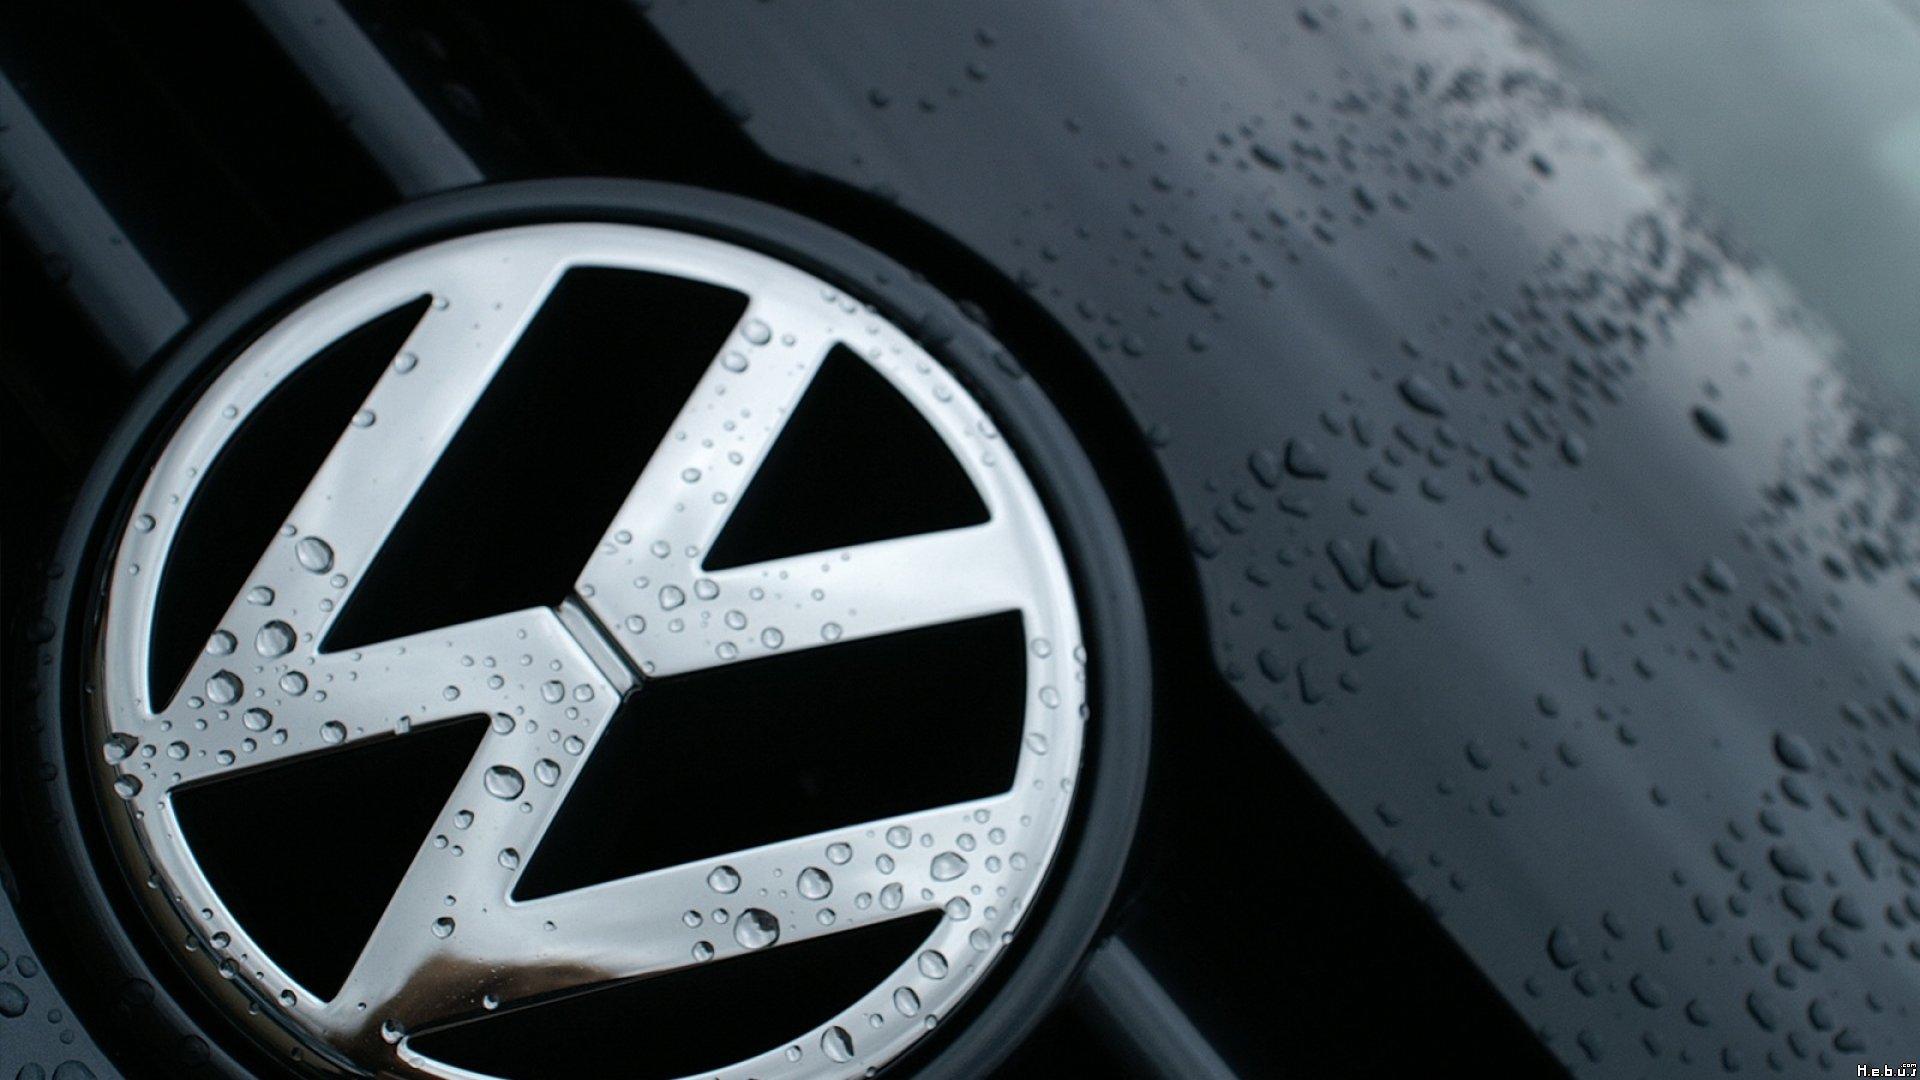 Vw Logo Hd Wallpaper Volkswagen logo wallpapers 1920x1080